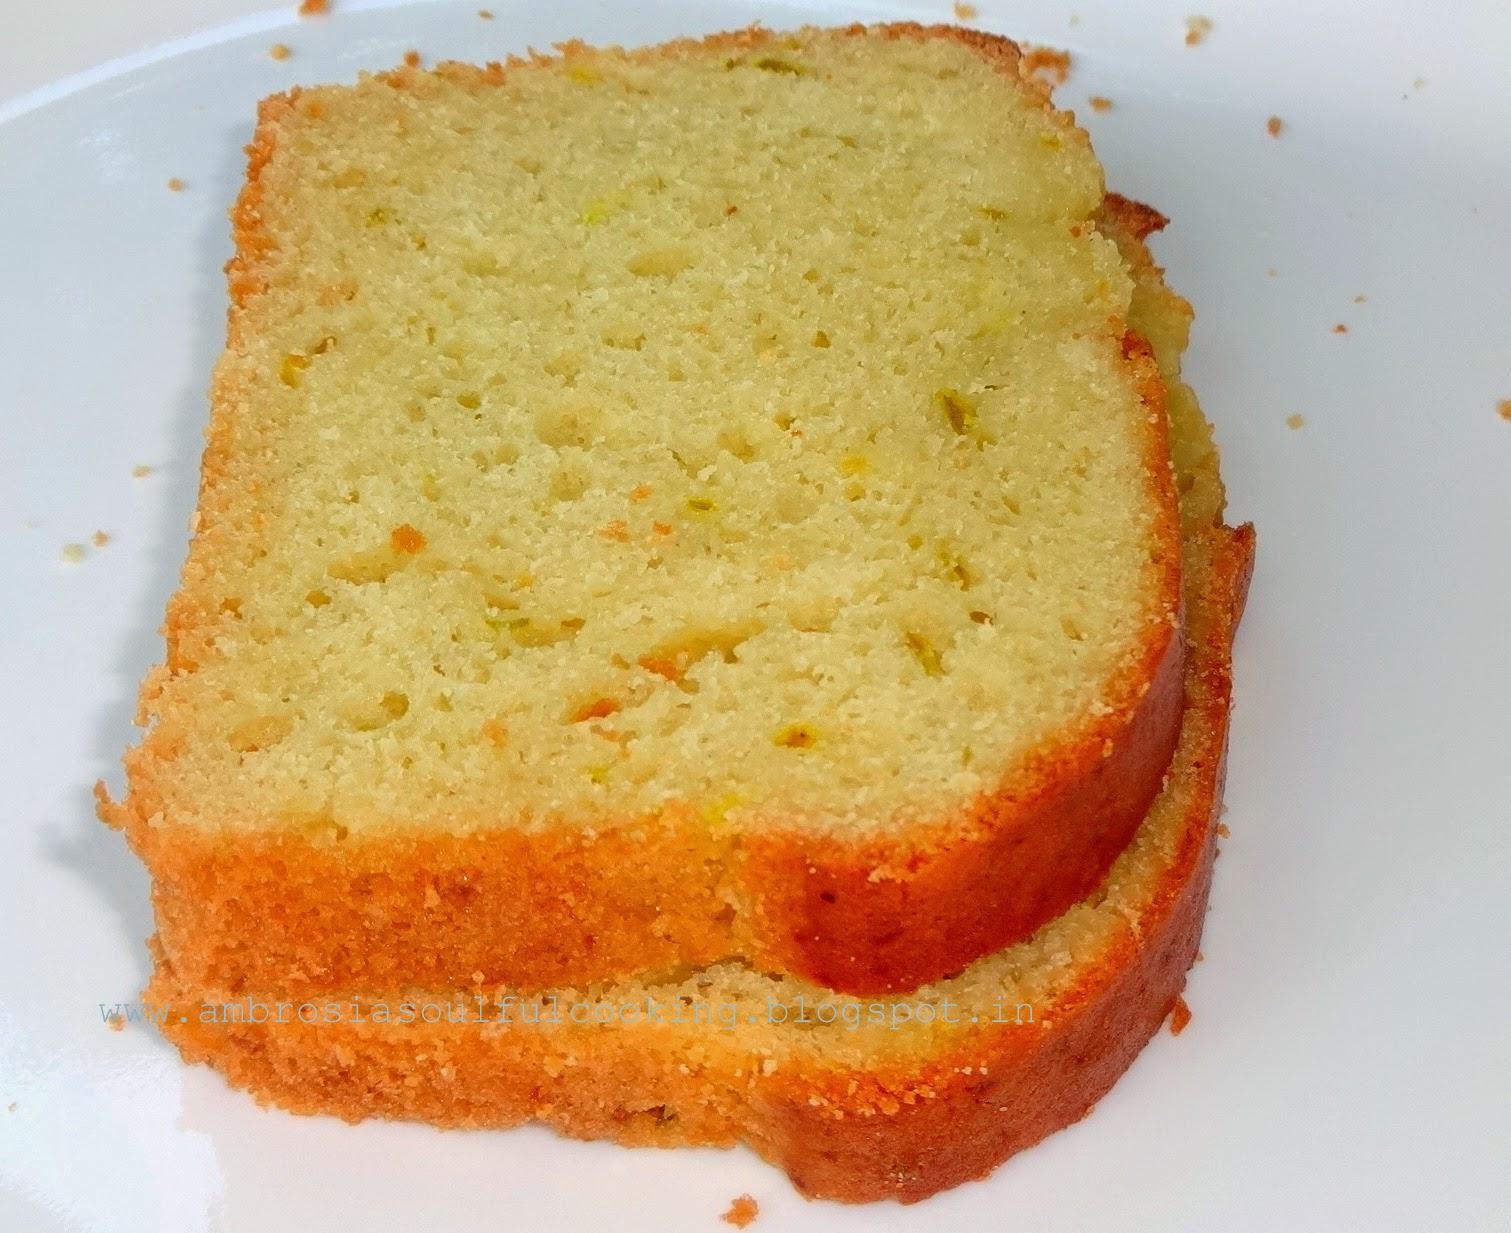 Low Sugar Loaf Cake Recipes: Low Fat Orange Loaf Cake